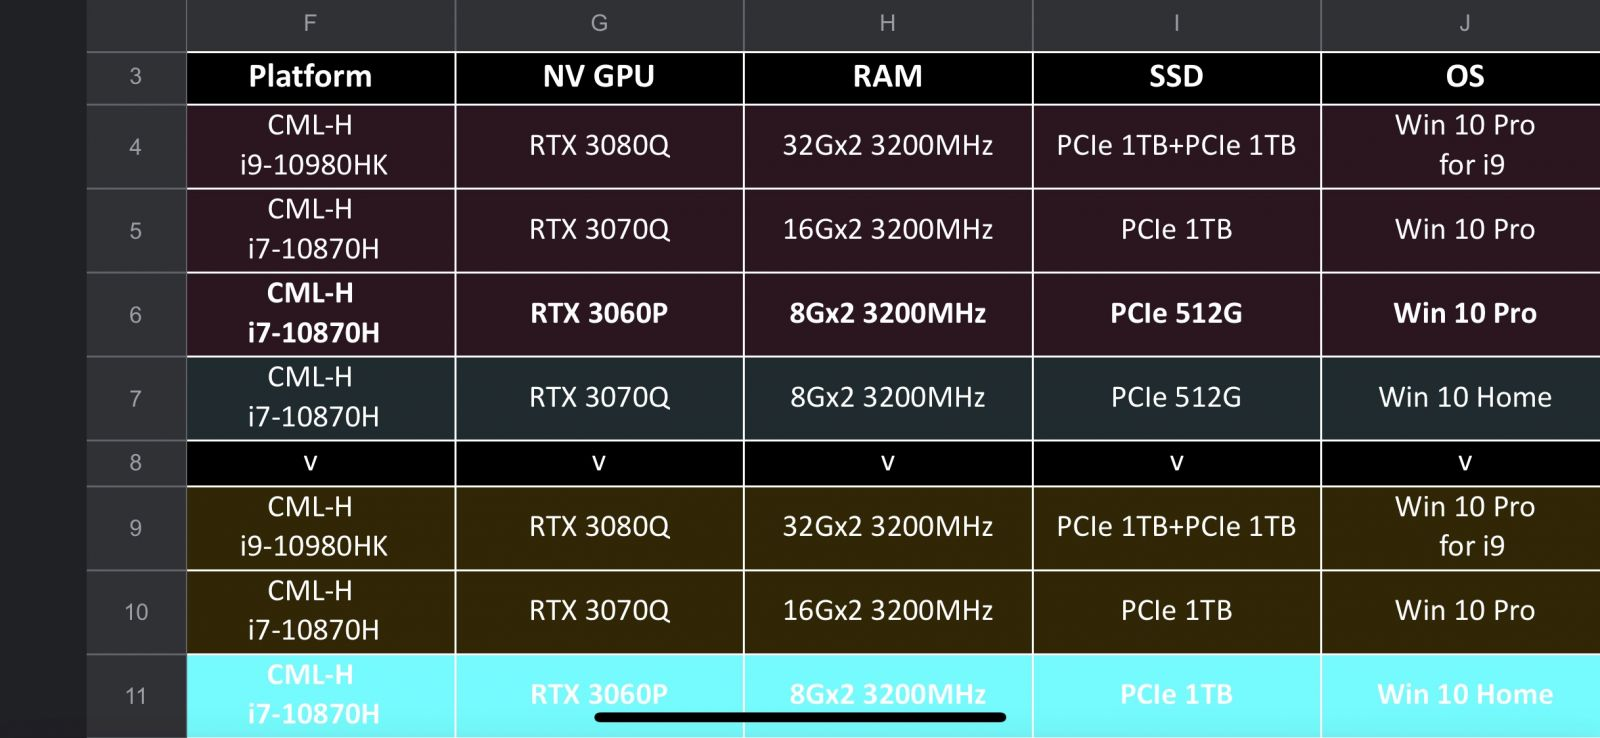 Nvidia Ampere RTX 3060 3070 3070 Max-Q Max-P Notebook Laptop GPU News Leak